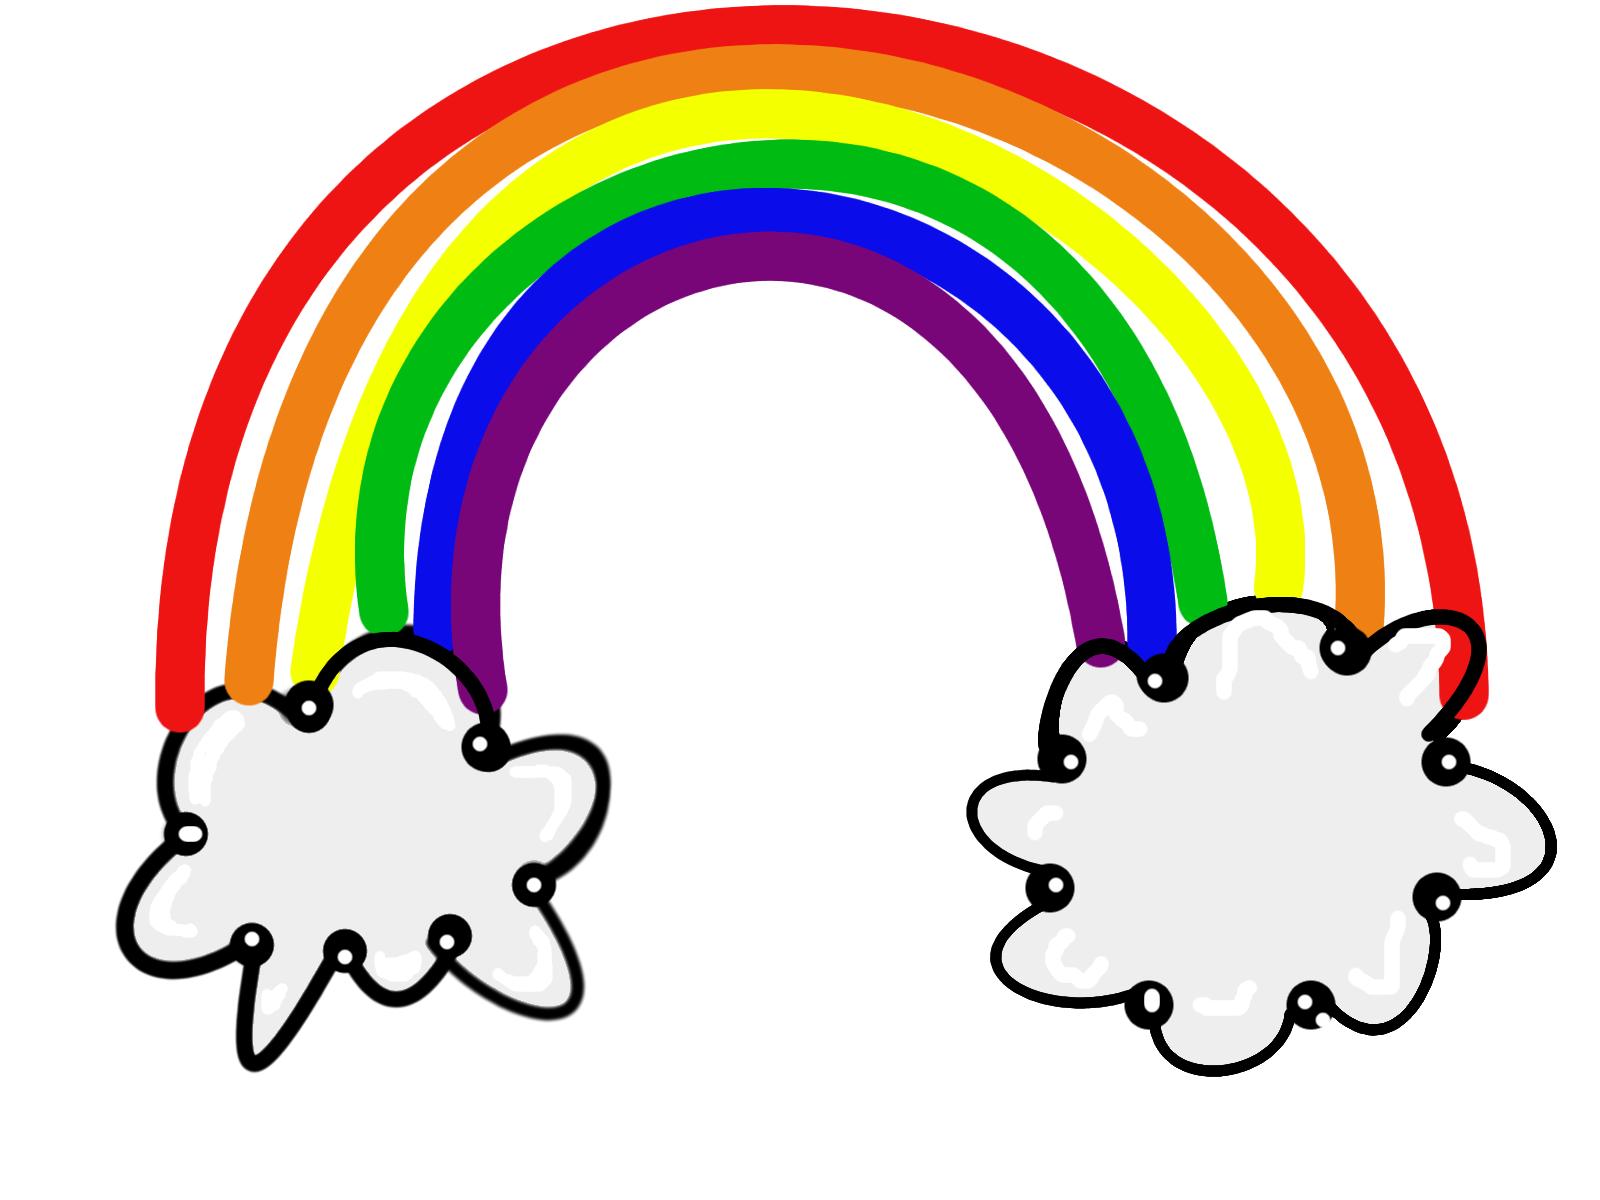 1600x1200 Rainbow Border Clip Art Image